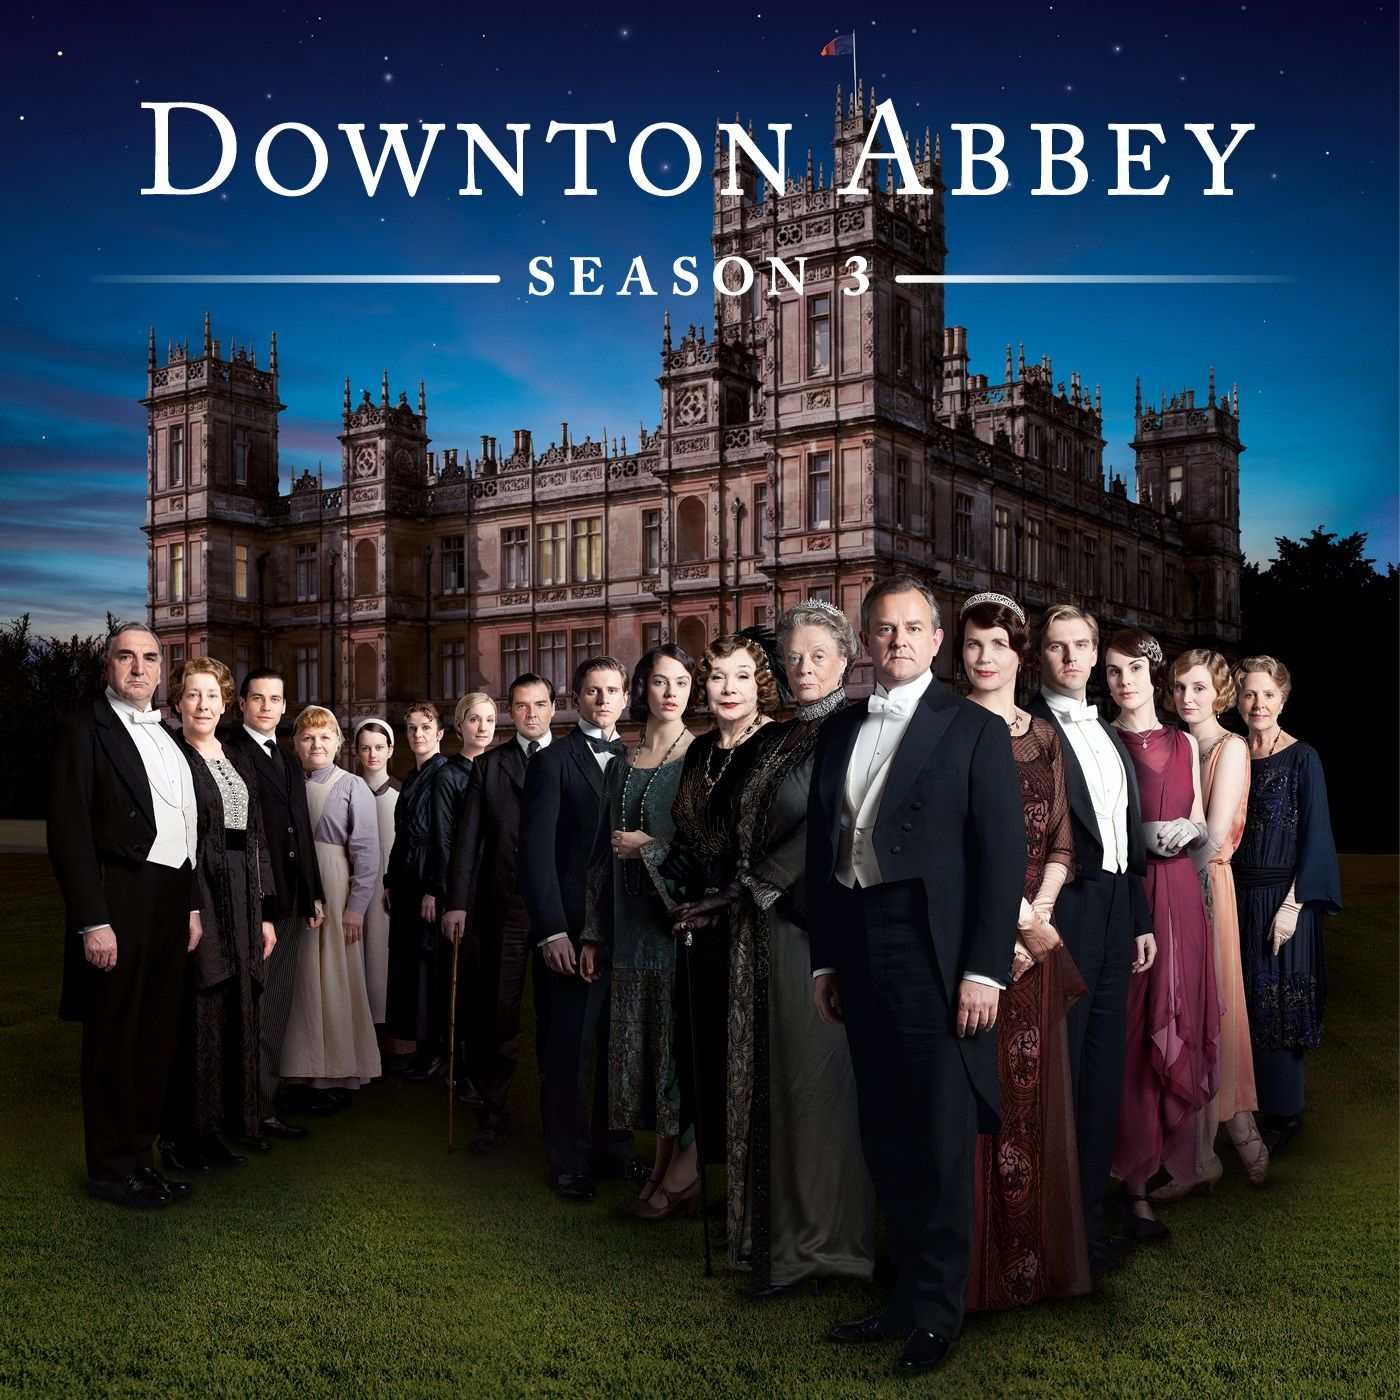 Downton Abbey | DVDRip | S 01-05 | S05E01-E04